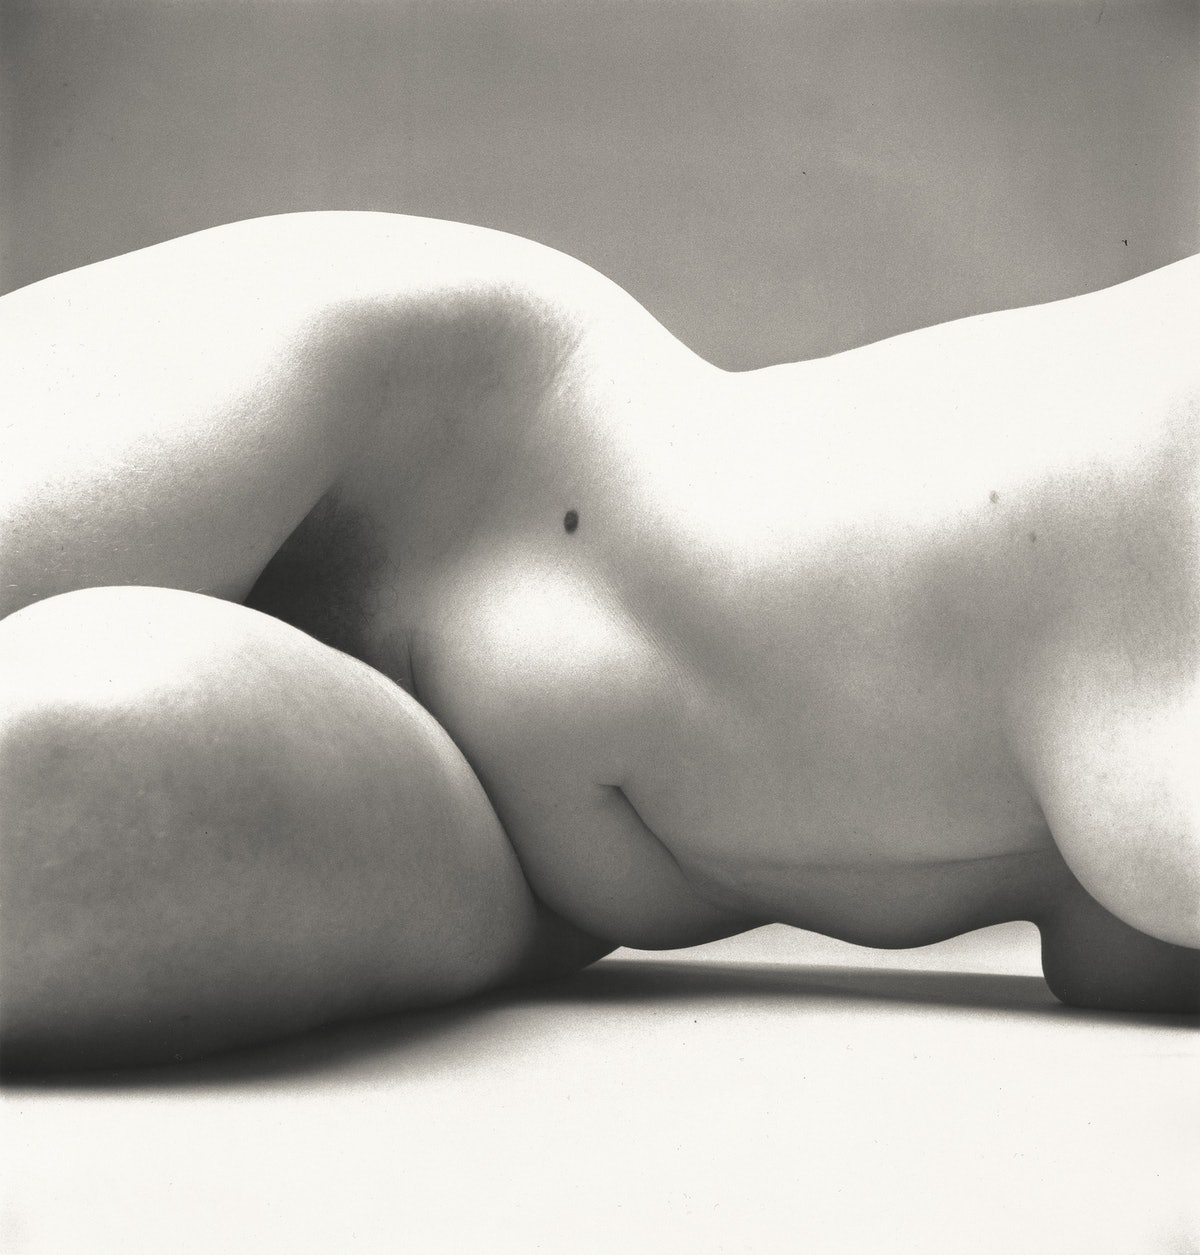 Nude 72.jpg